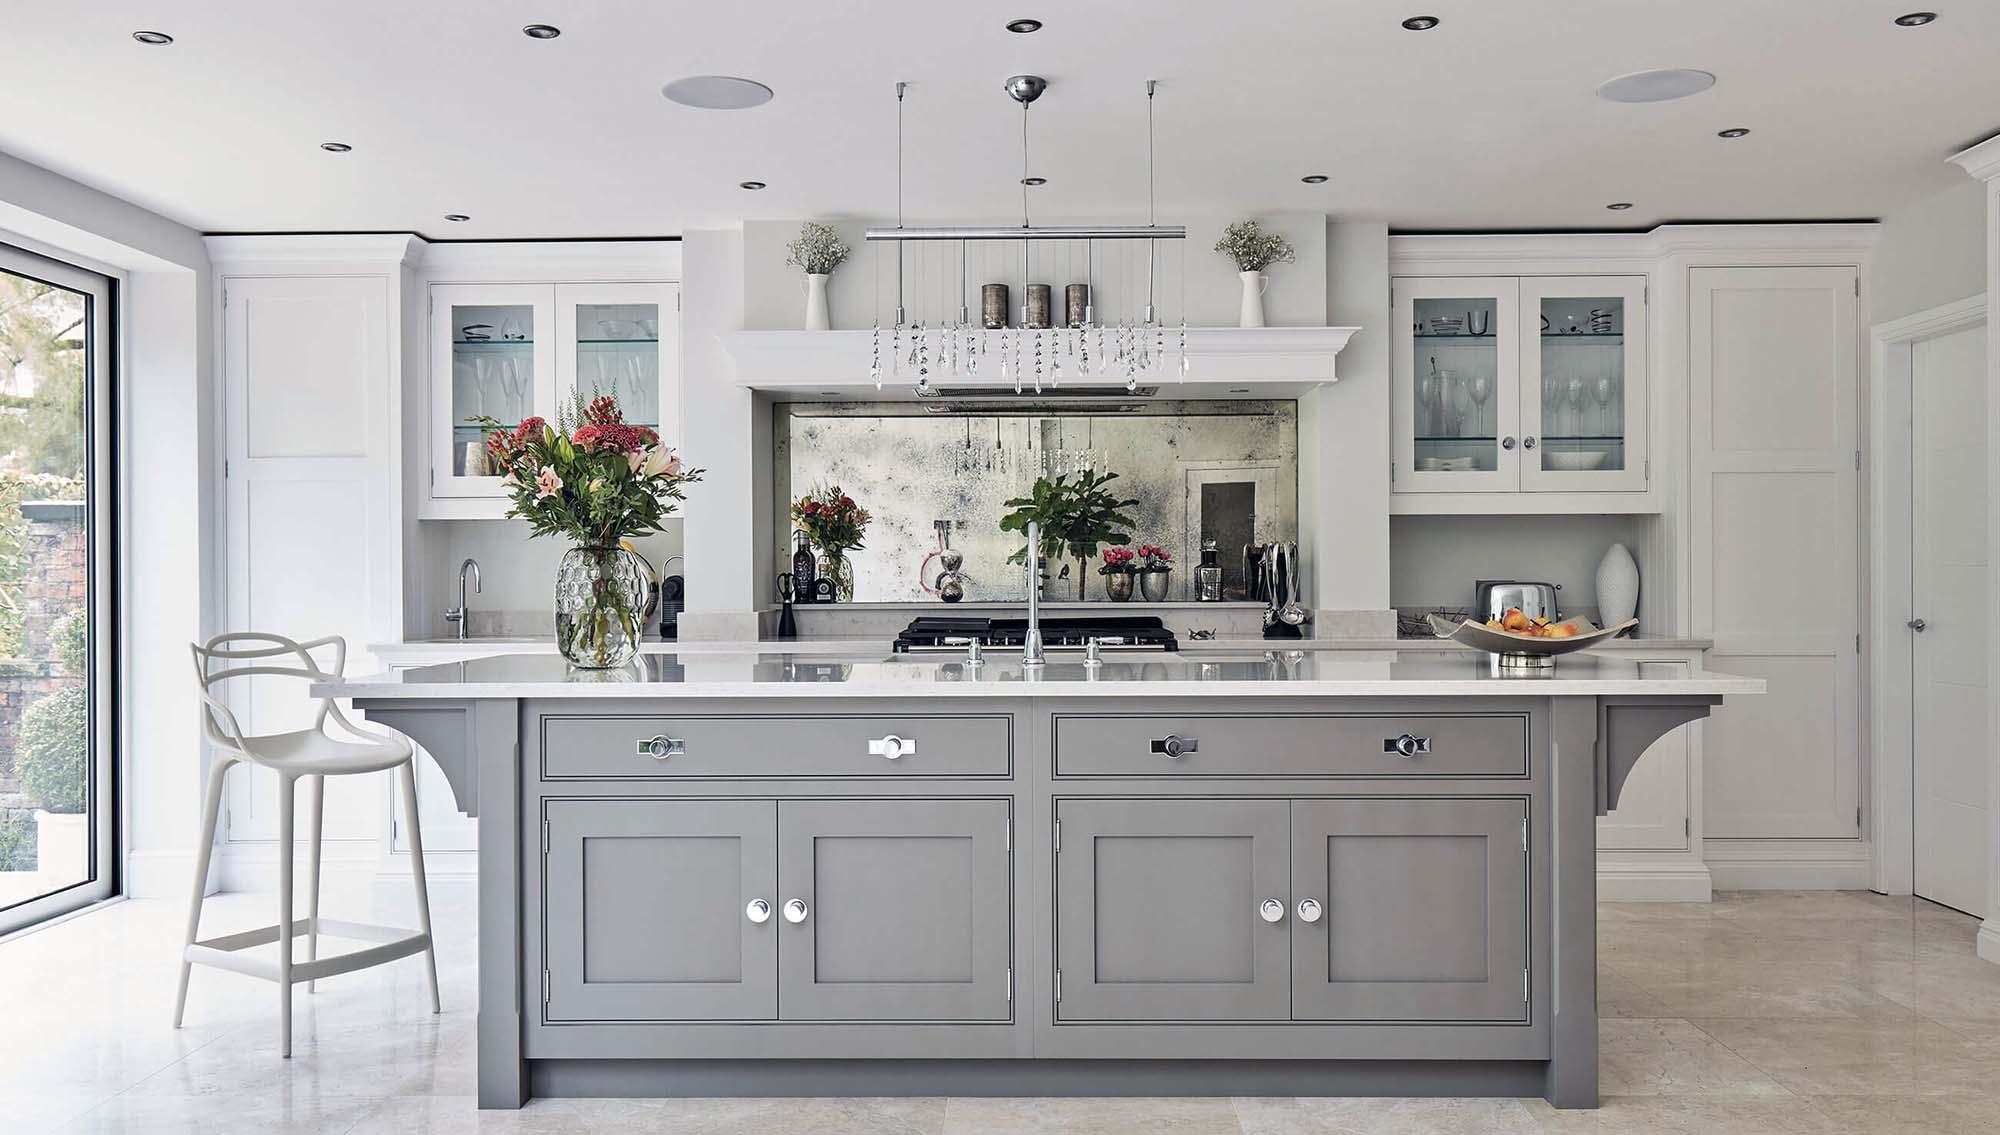 top luxury kitchen design ideas | 2019 - tips, pics & design ideas